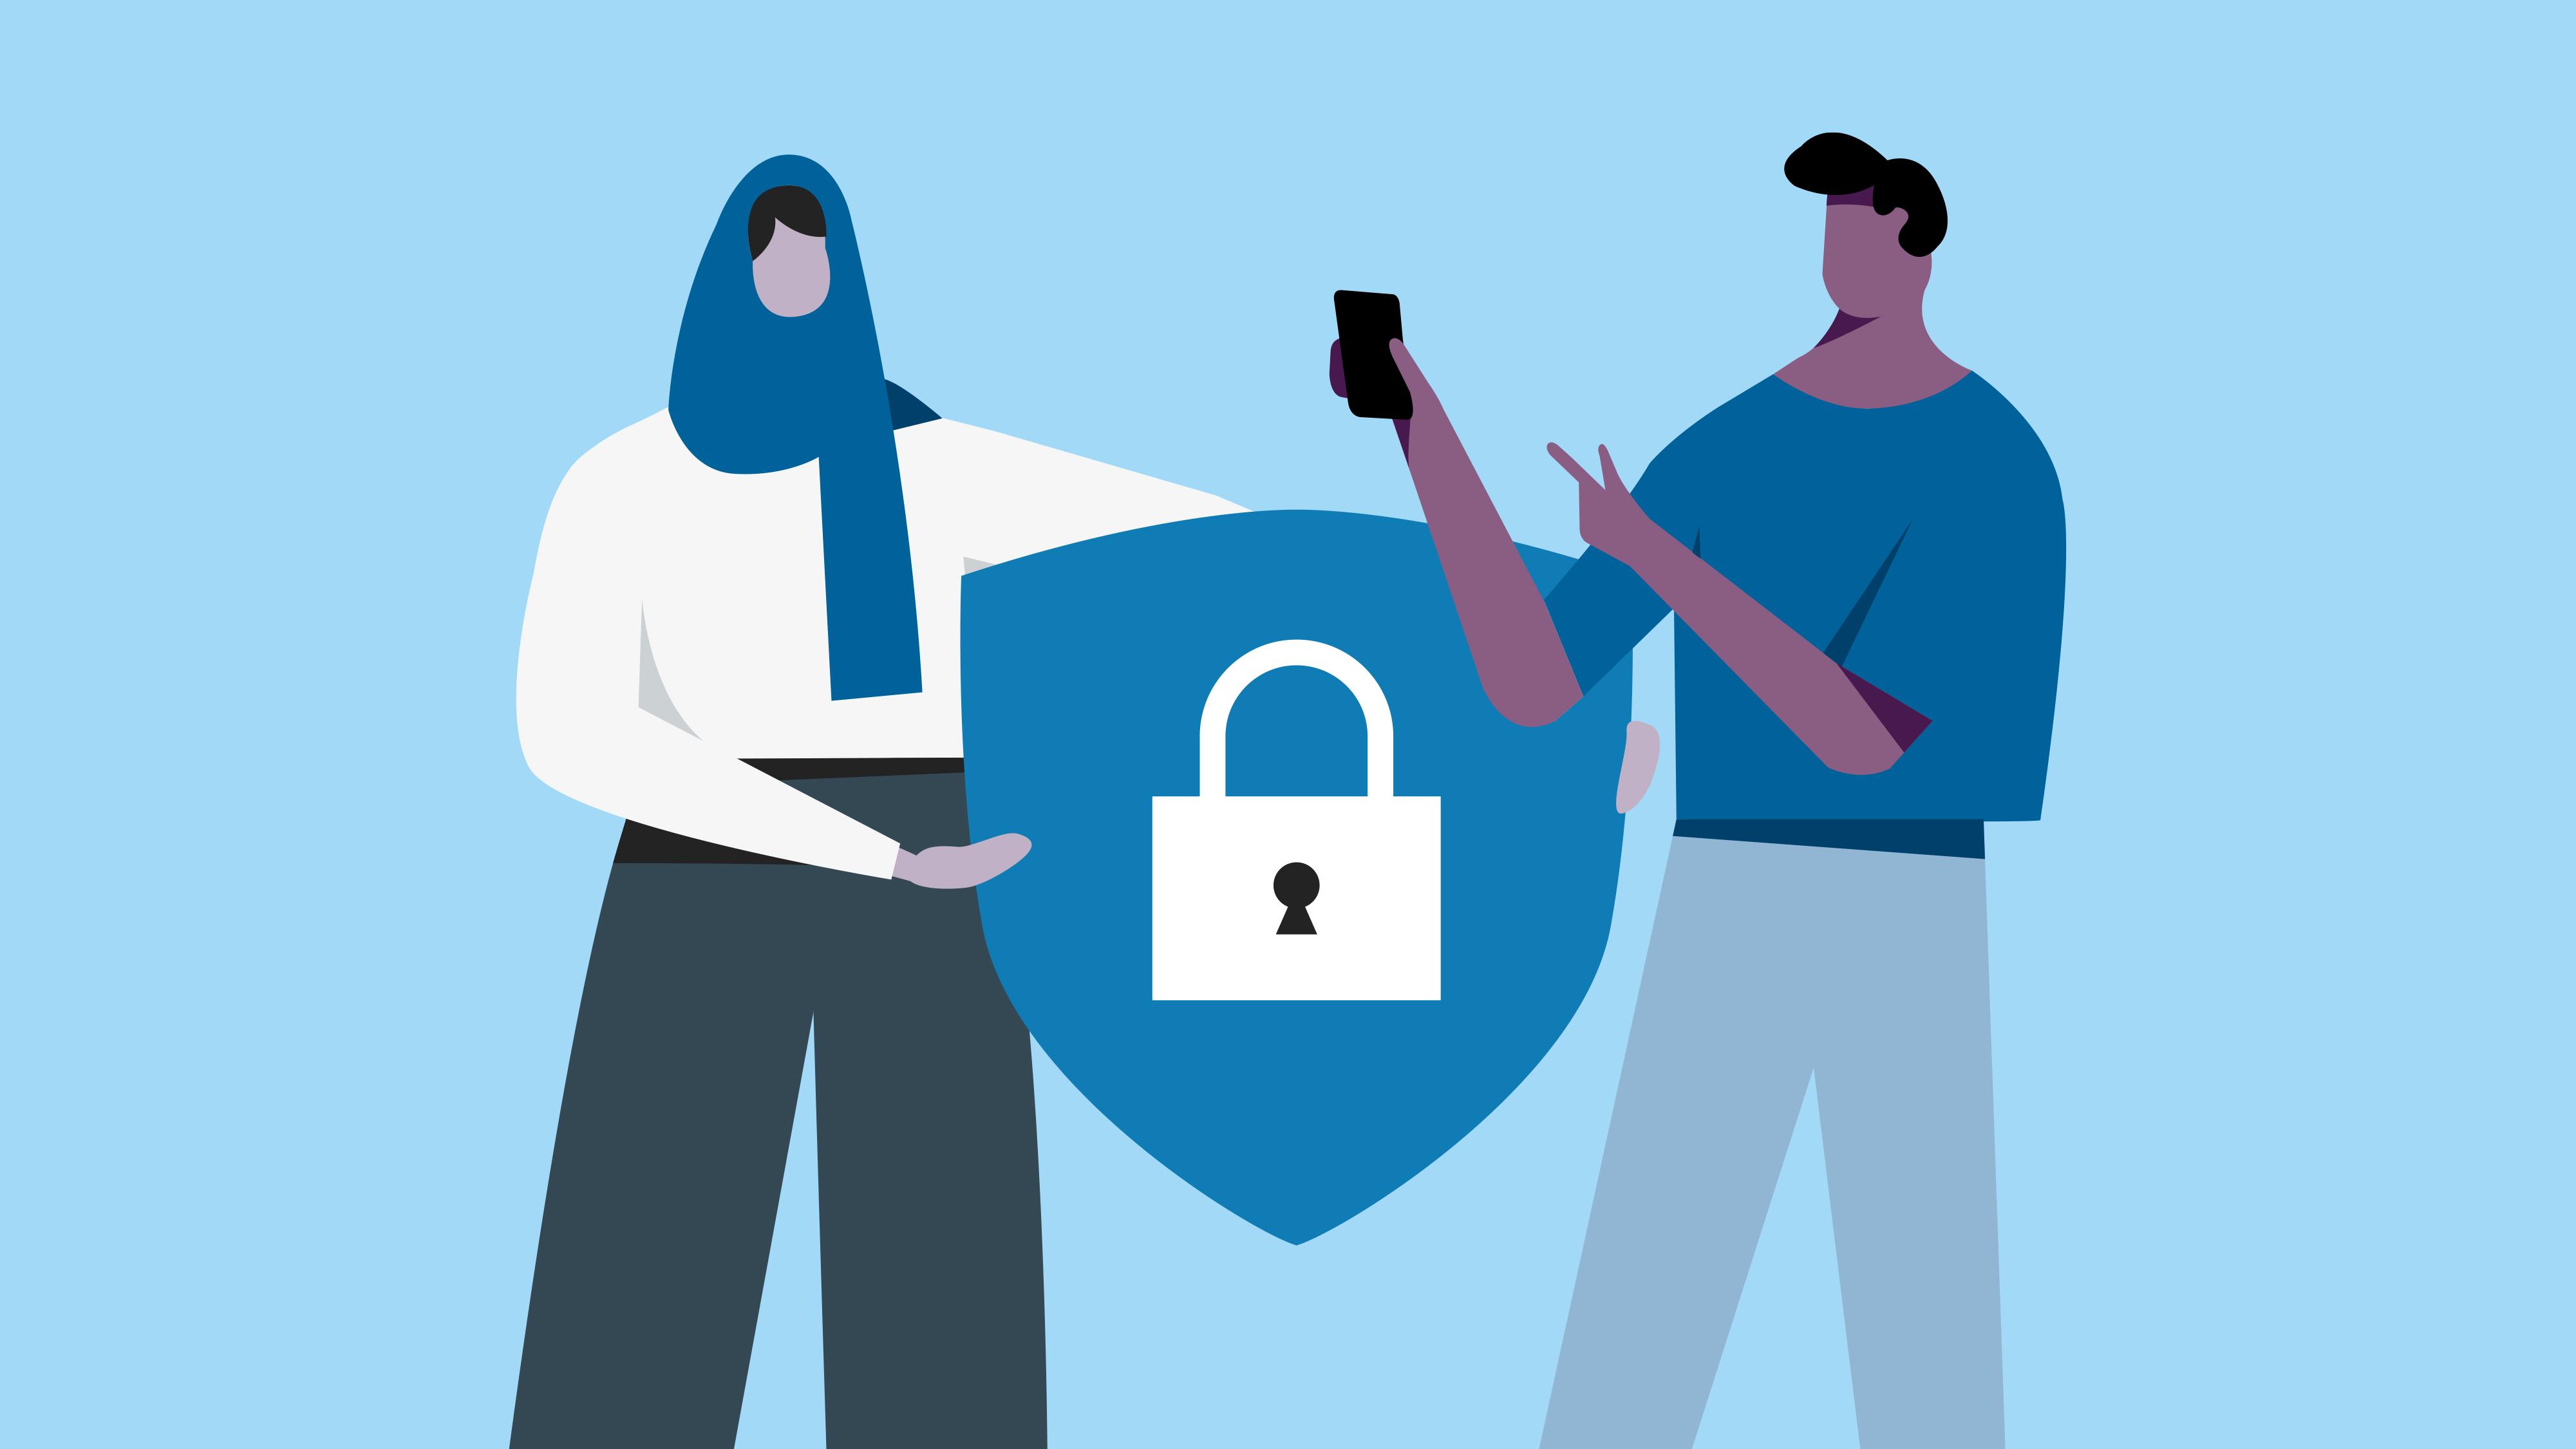 Privacy illustration